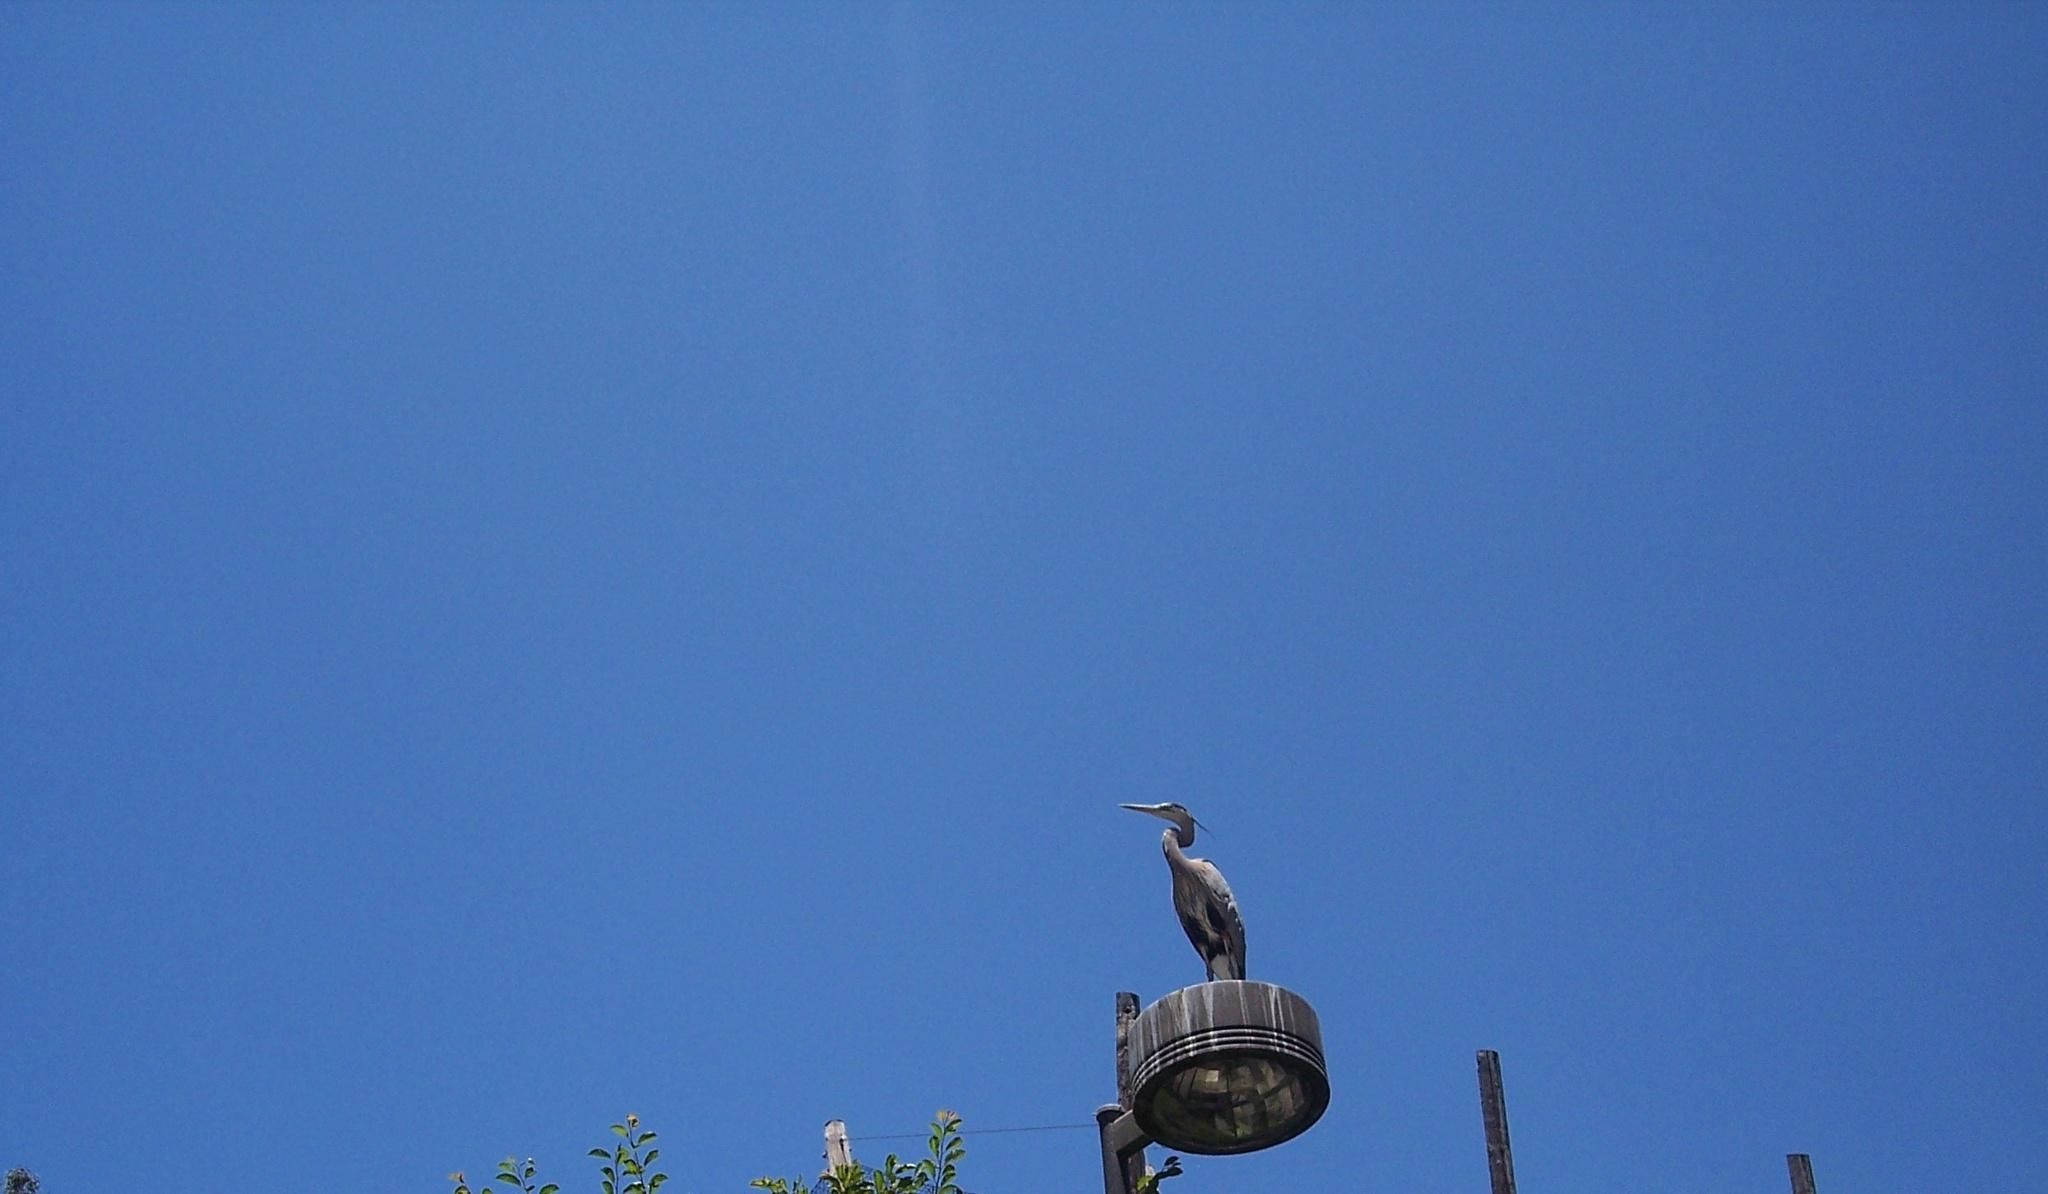 Crane Way Up High by ssmjdd